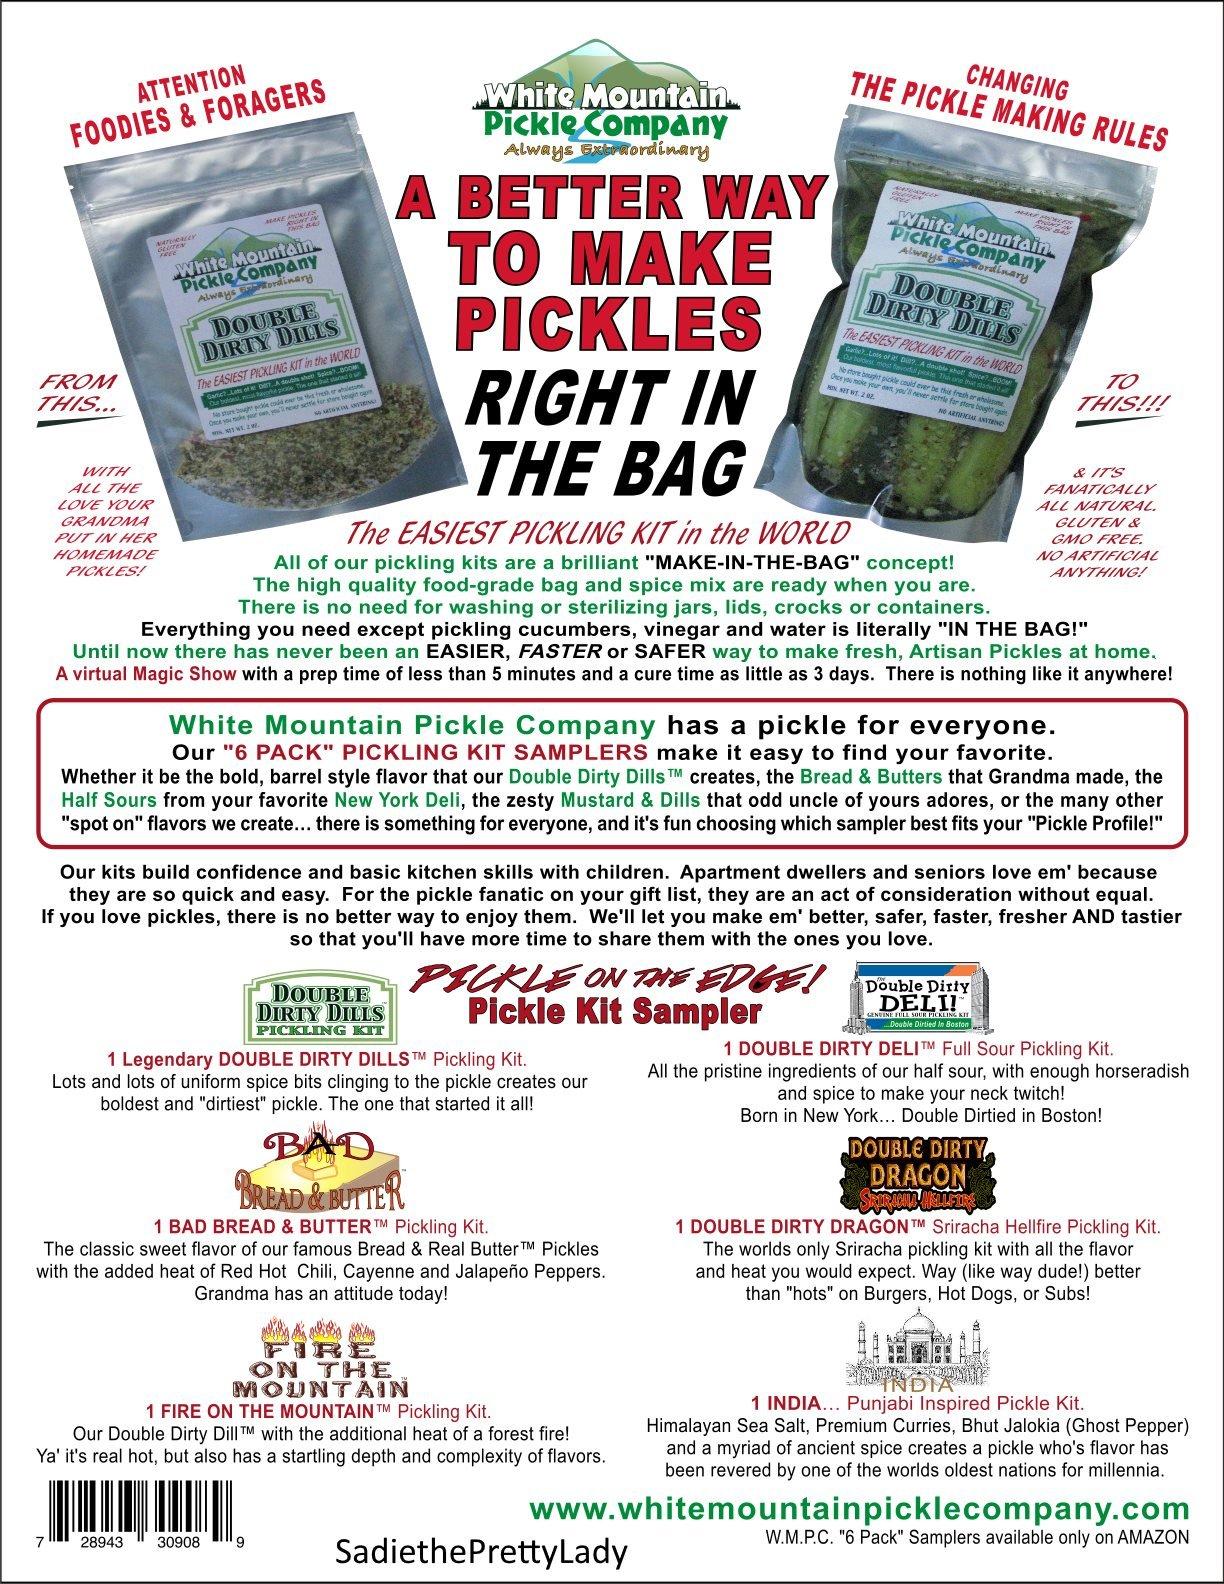 White Mountain Pickle Company ''Pickle On The Edge'' Sampler Pickling Kit - 6 Pack